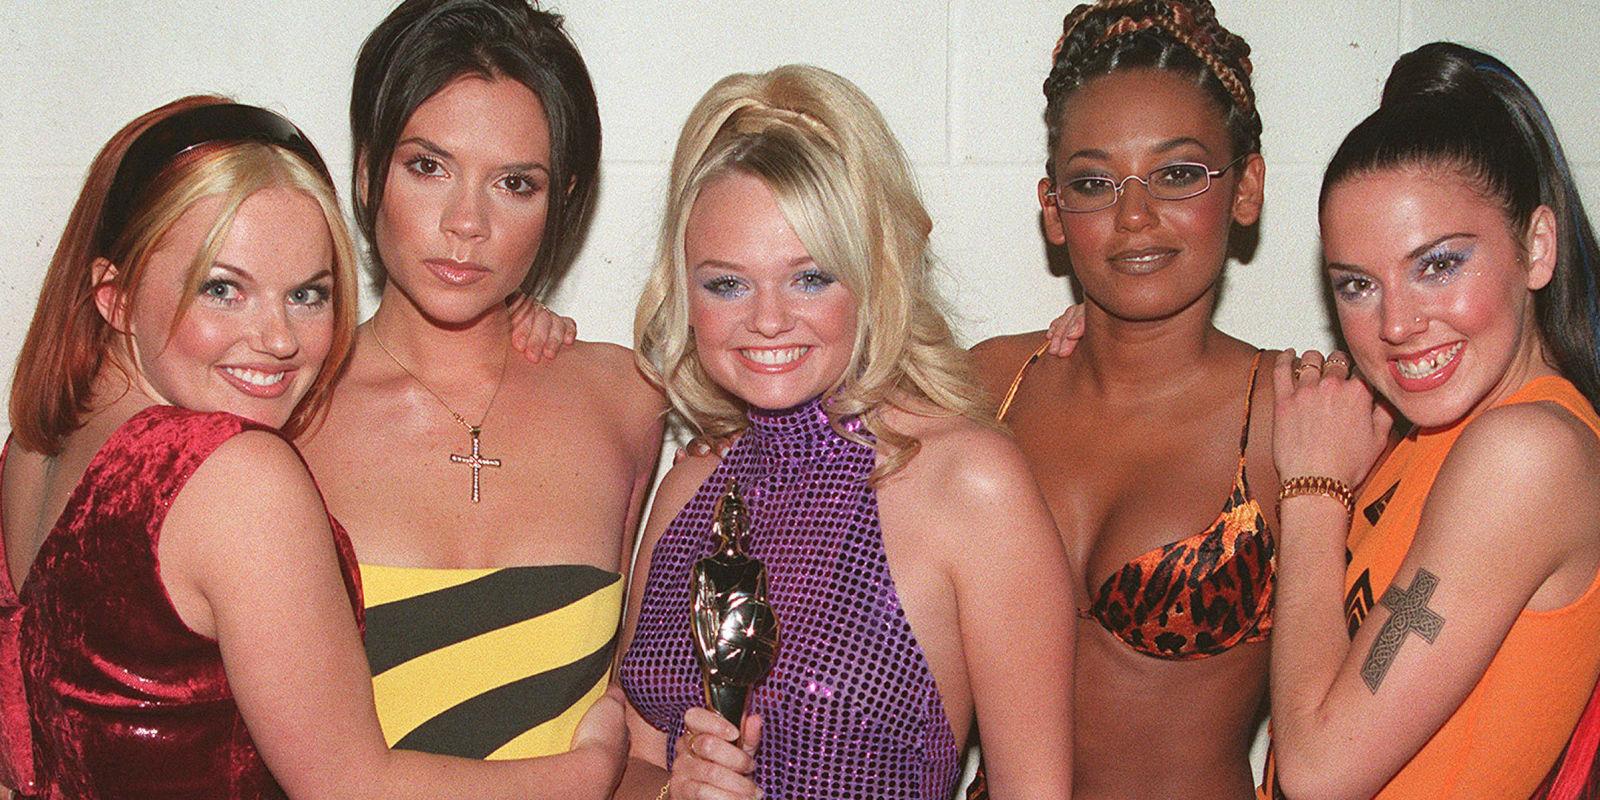 High Resolution Wallpaper   Spice Girls 1600x800 px